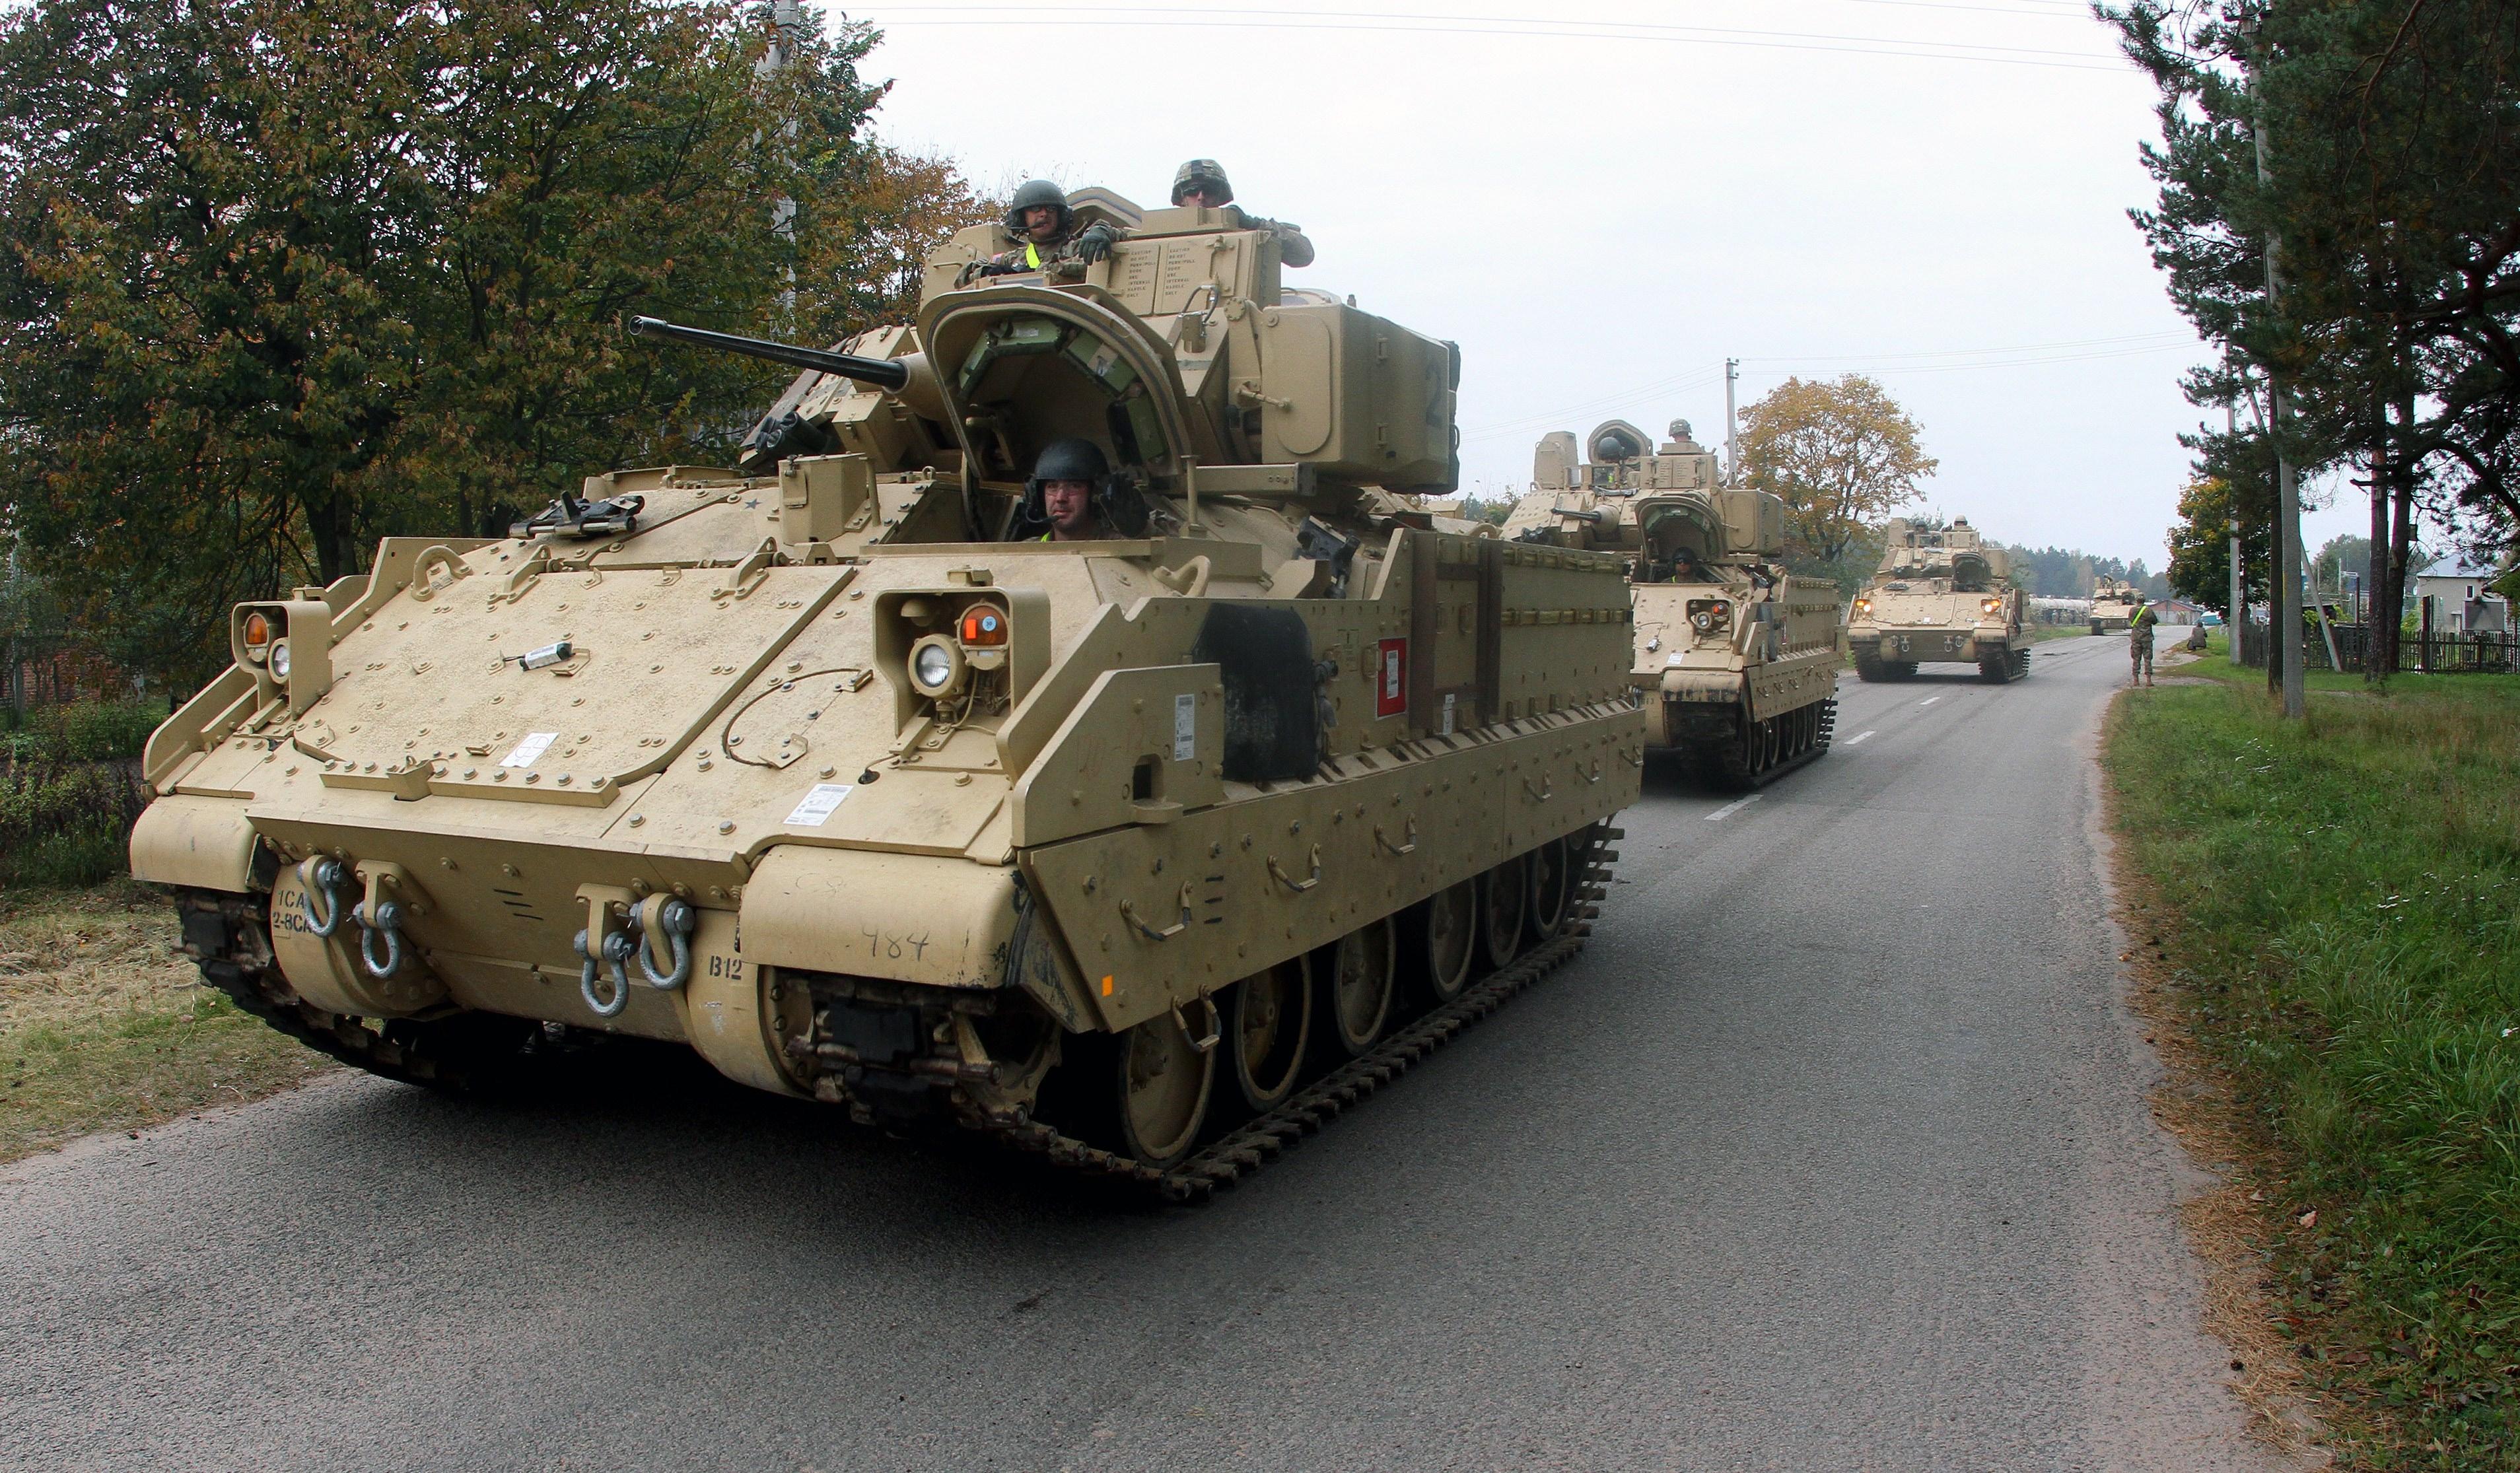 Tanks in Europe